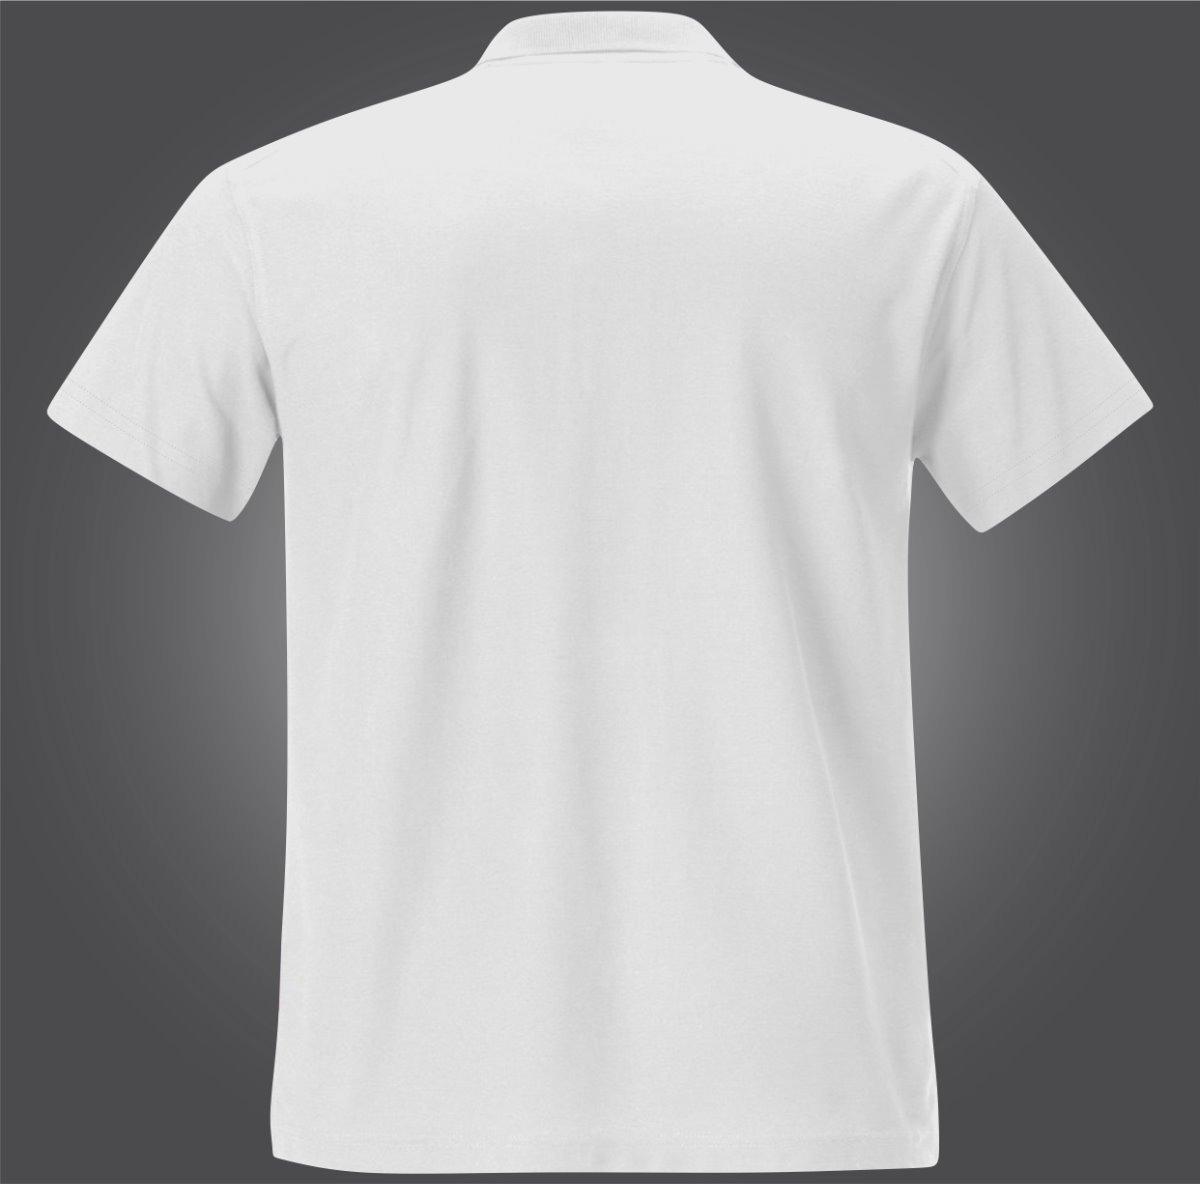 bce1b47ab9 polo camisetas masculina camiseta feminino camisa uniforme. Carregando zoom.